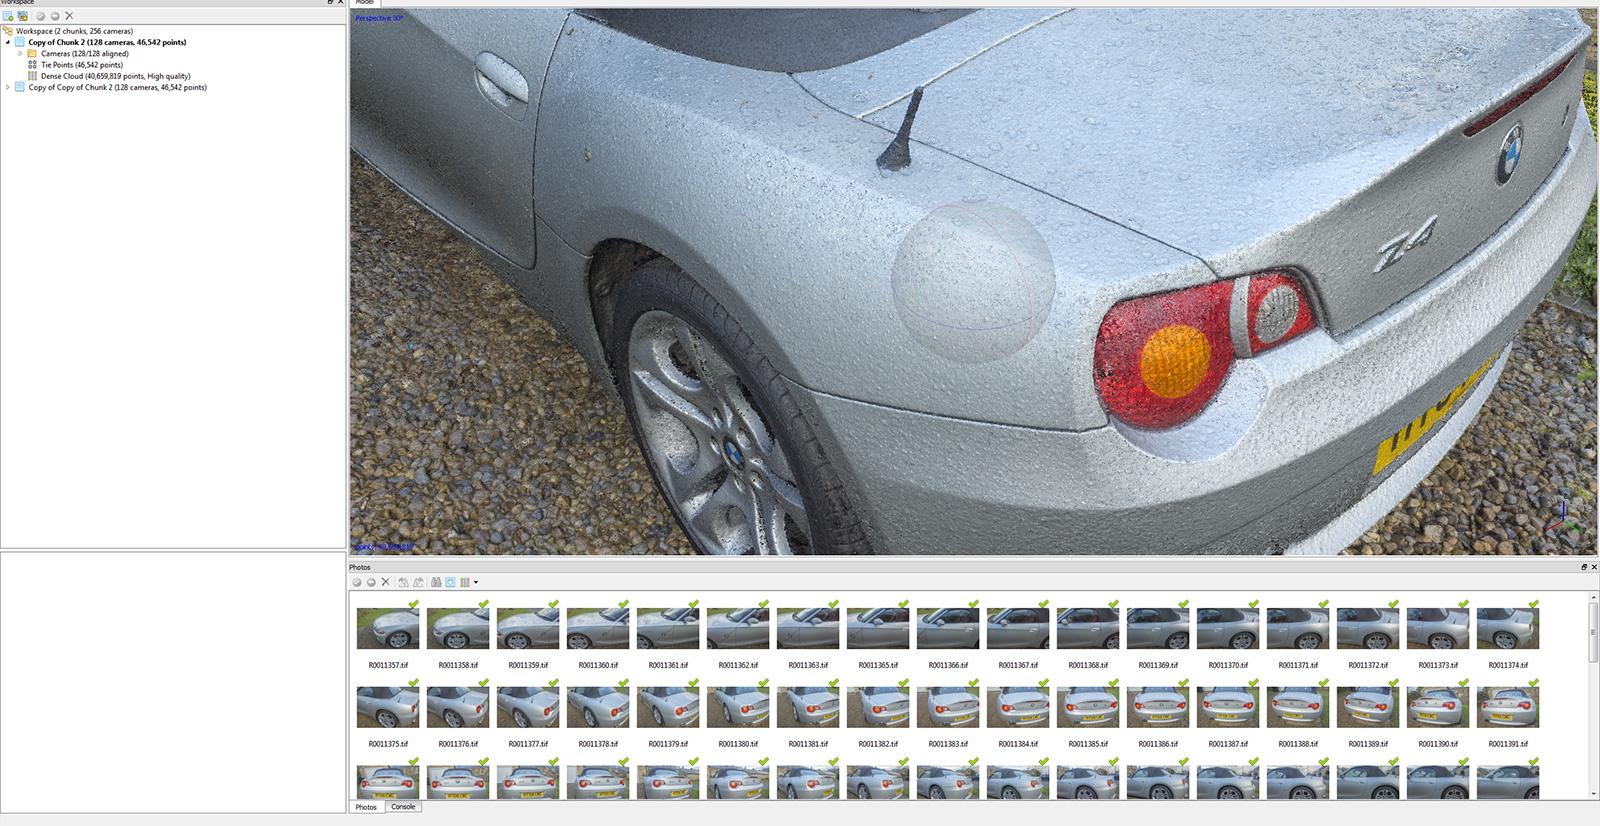 car_photogrammetry_tracking_info.jpg